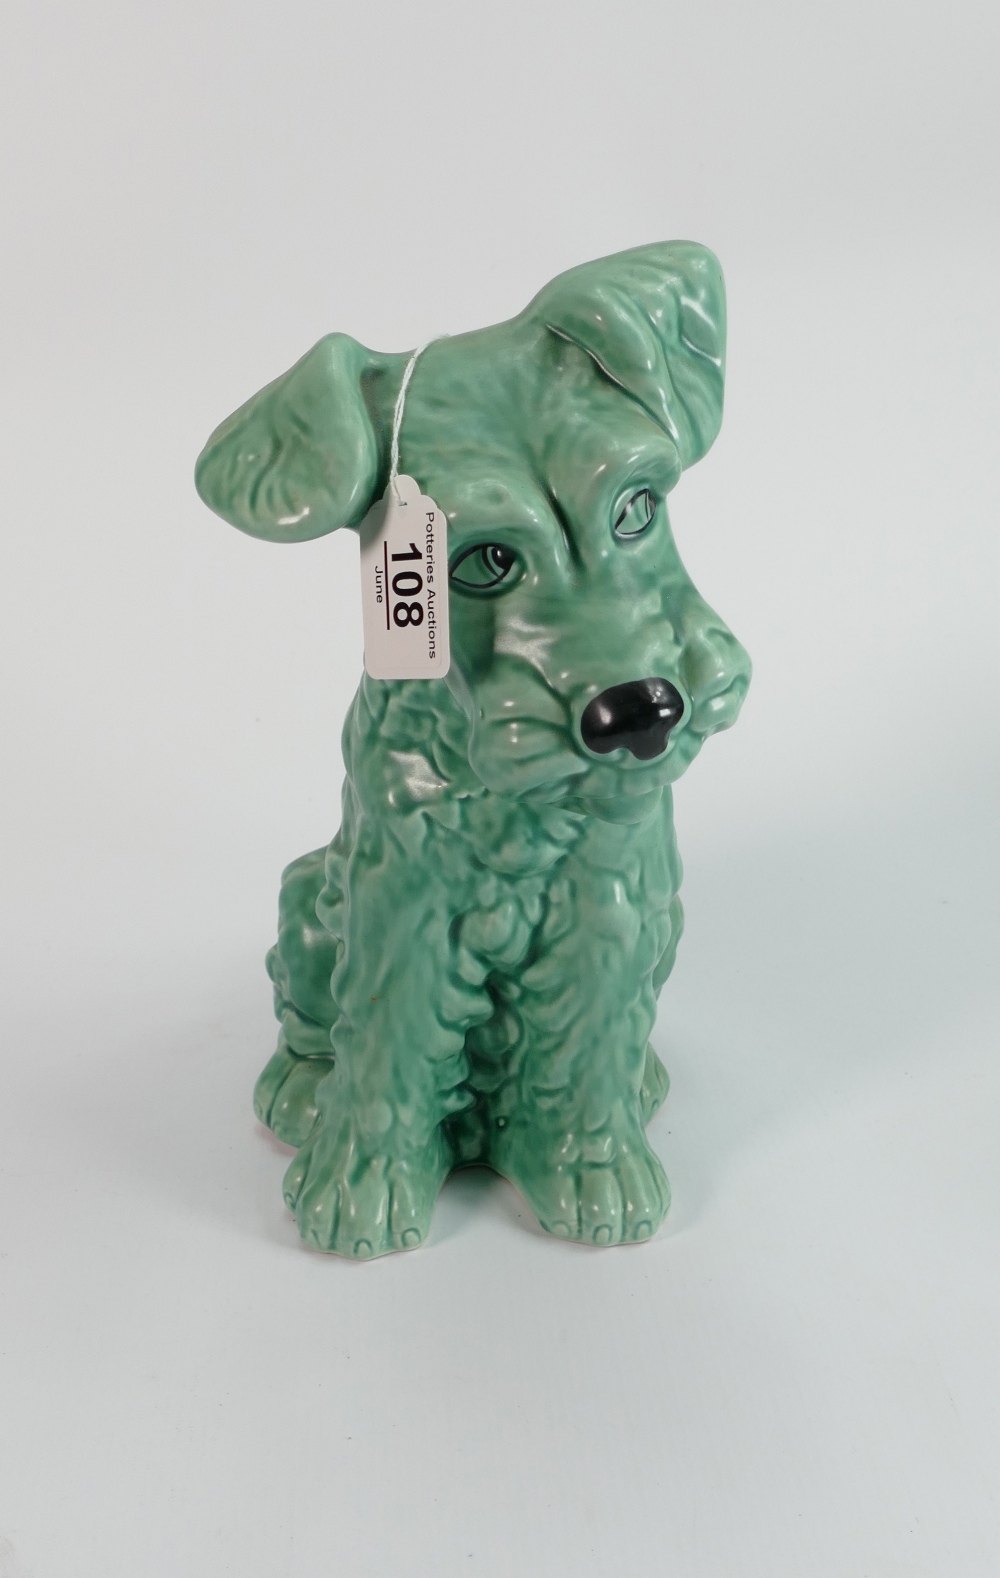 Large green Sylvac dog ref 1380: 29 cm high. - Image 2 of 2